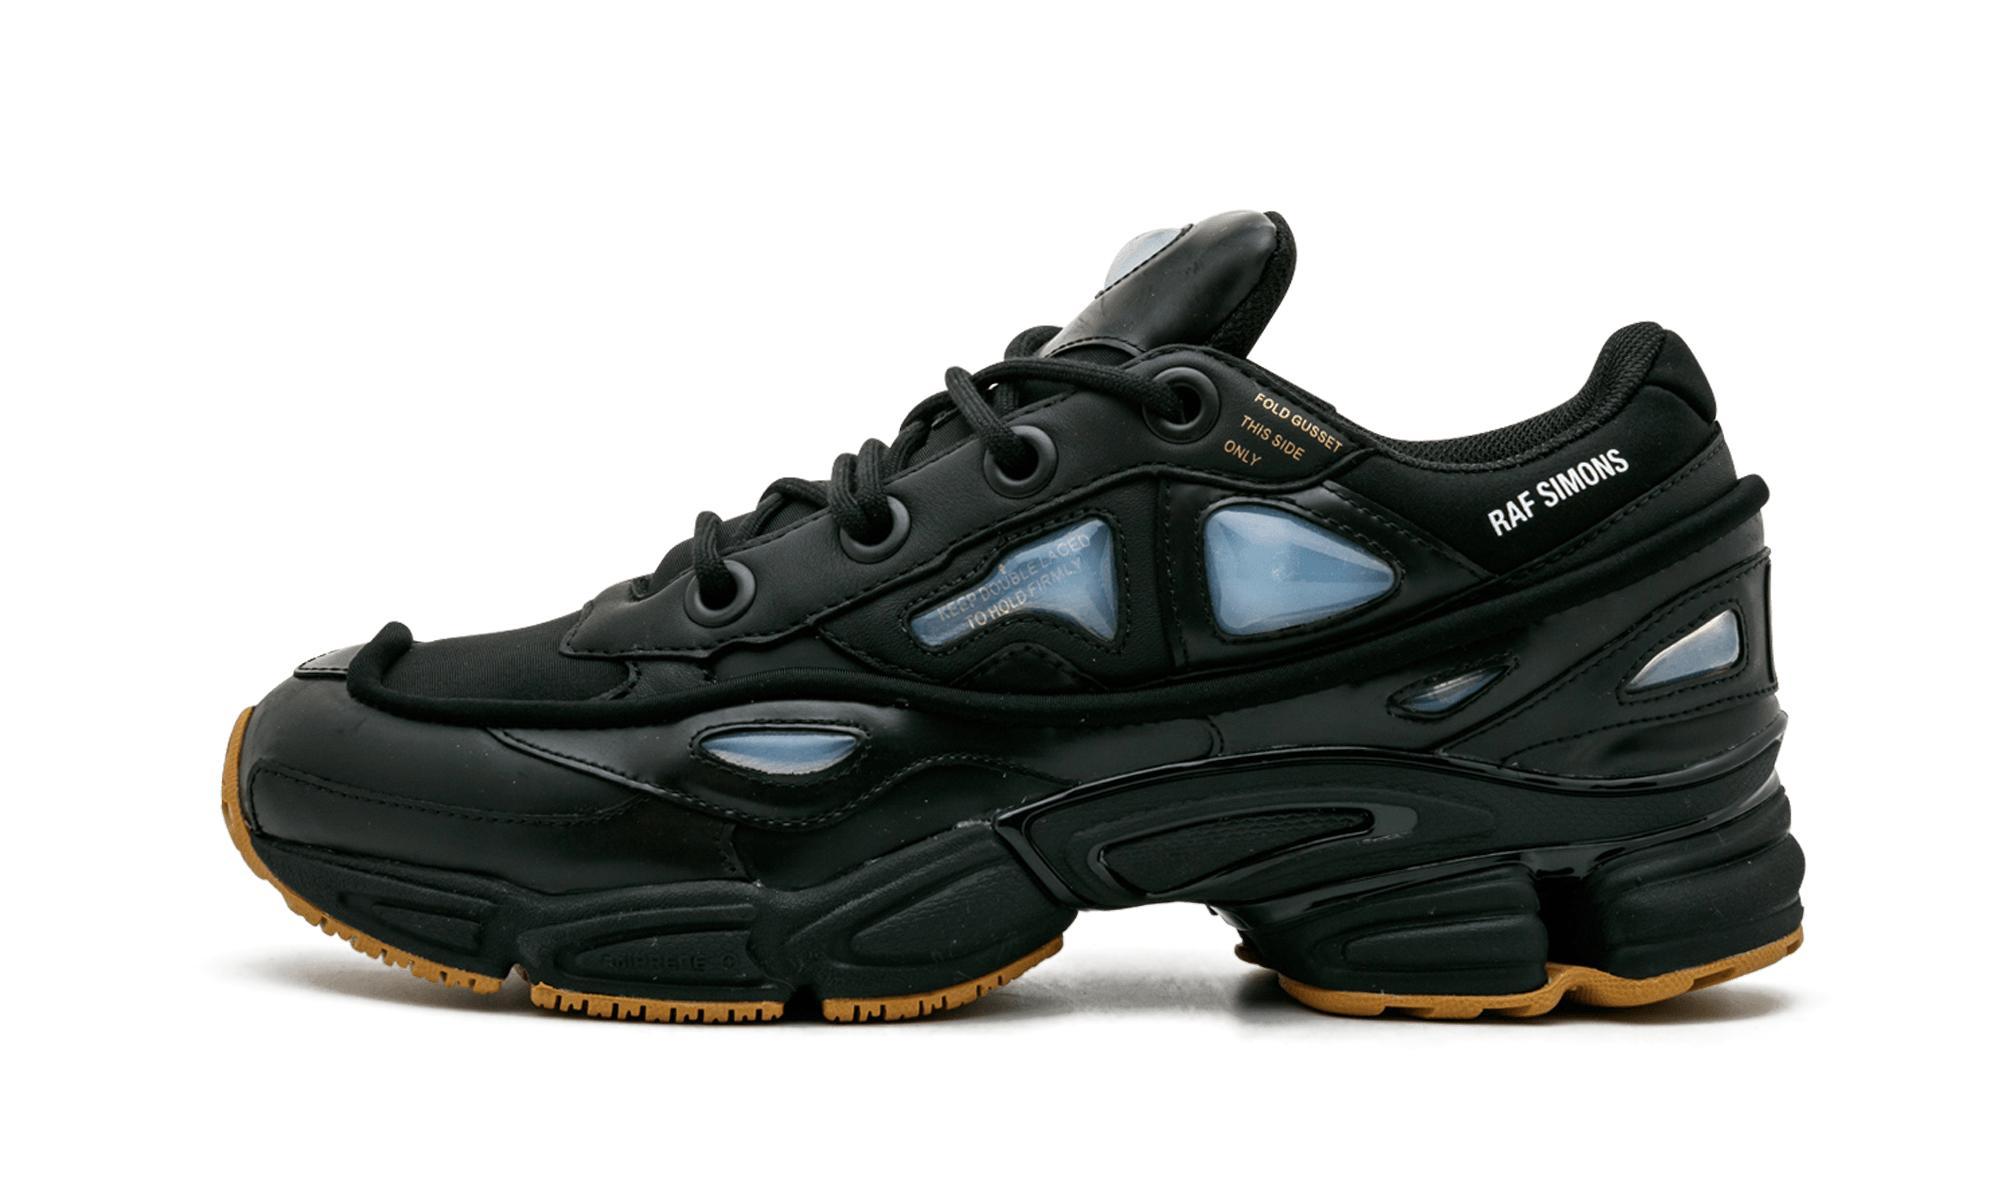 5255c78bc25 Lyst - adidas Raf Simons Ozweego Bunny in Black for Men